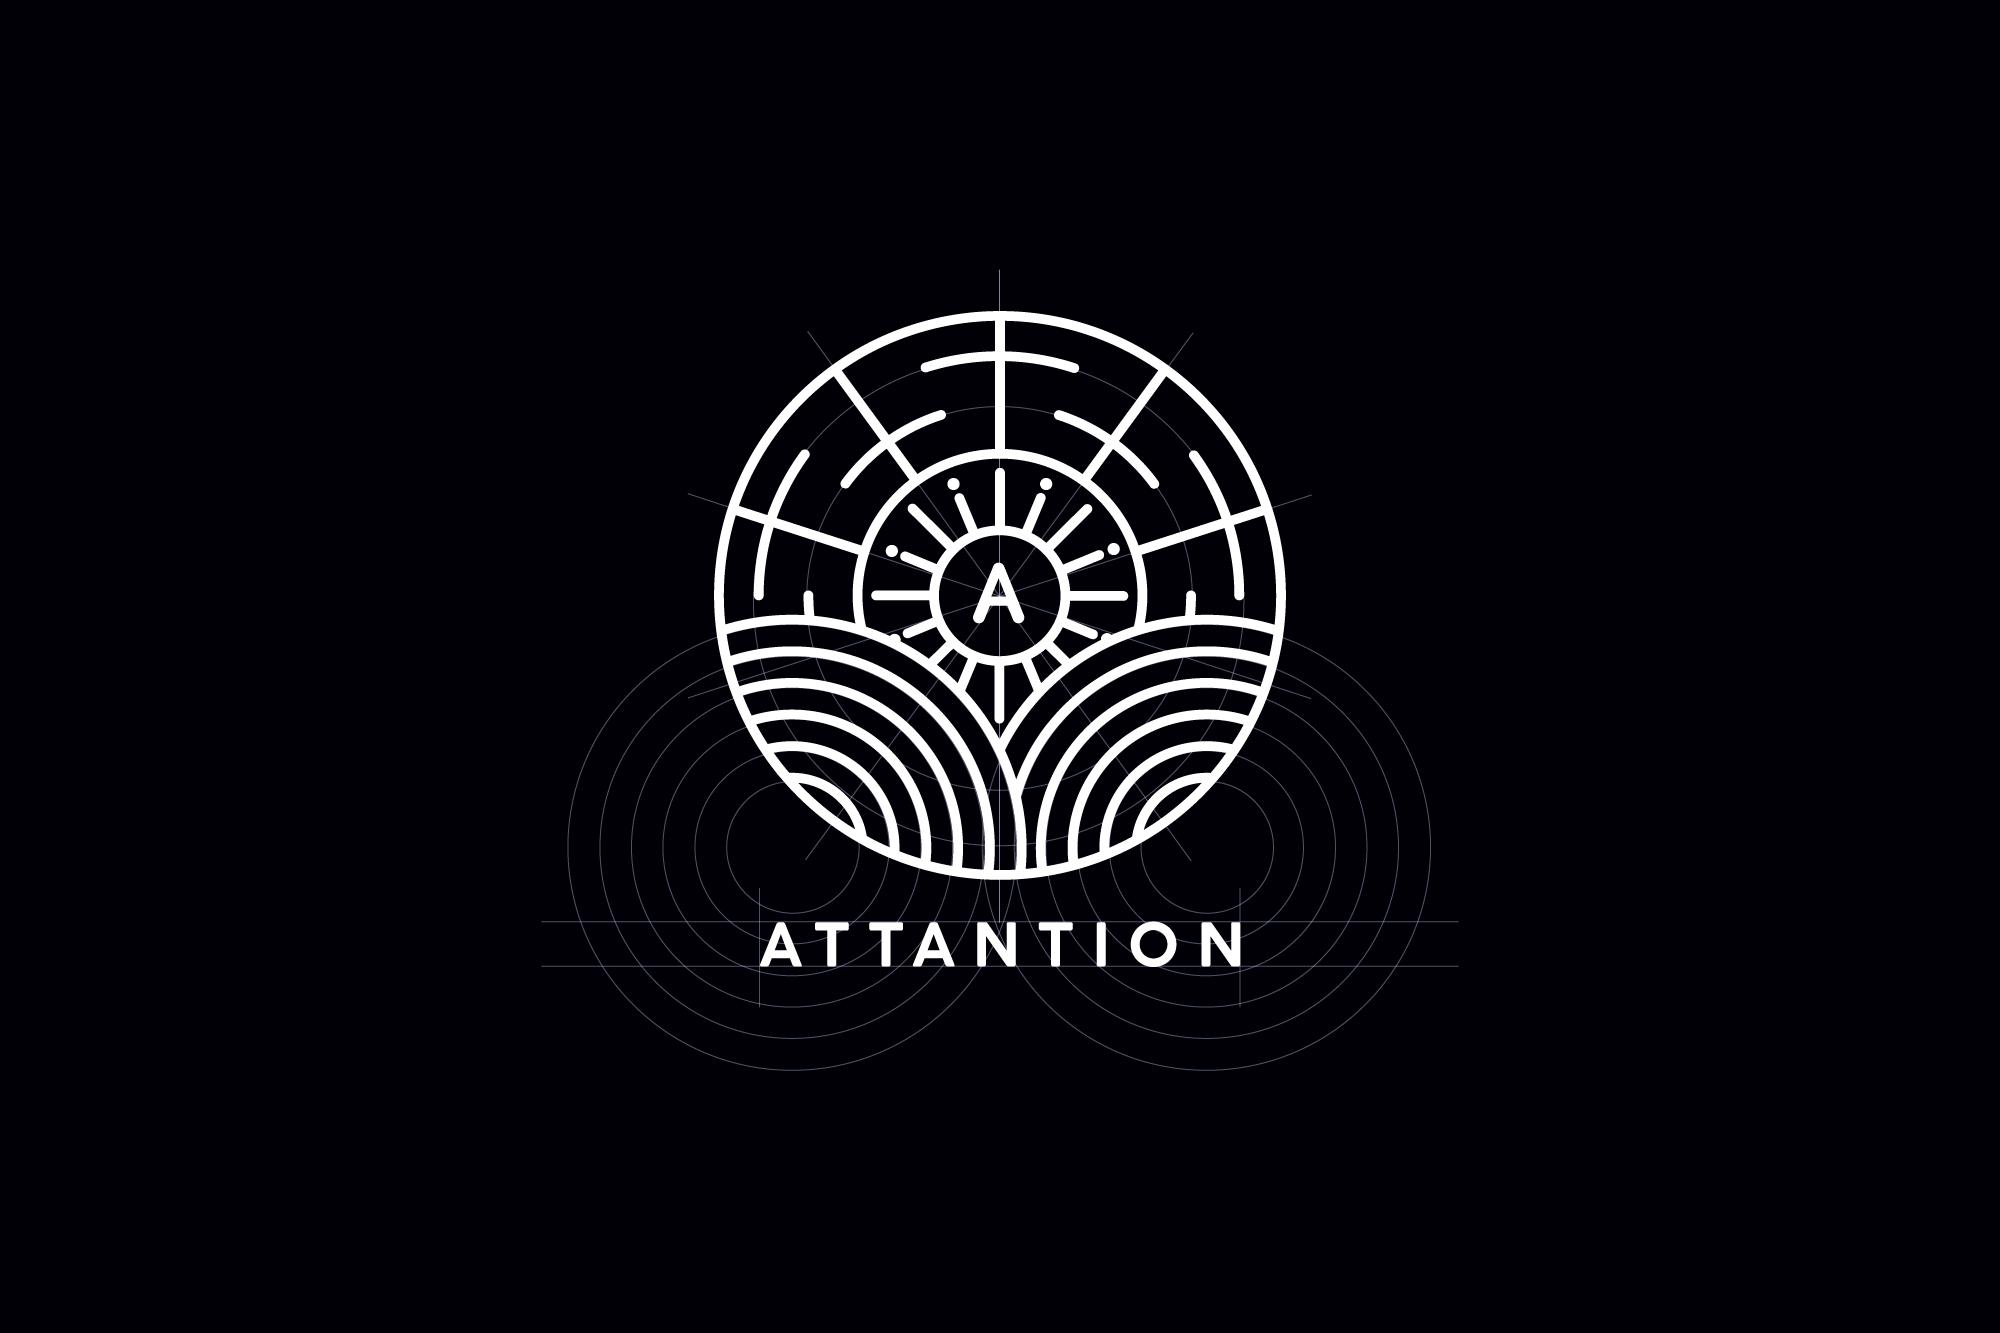 Attantion logo construction